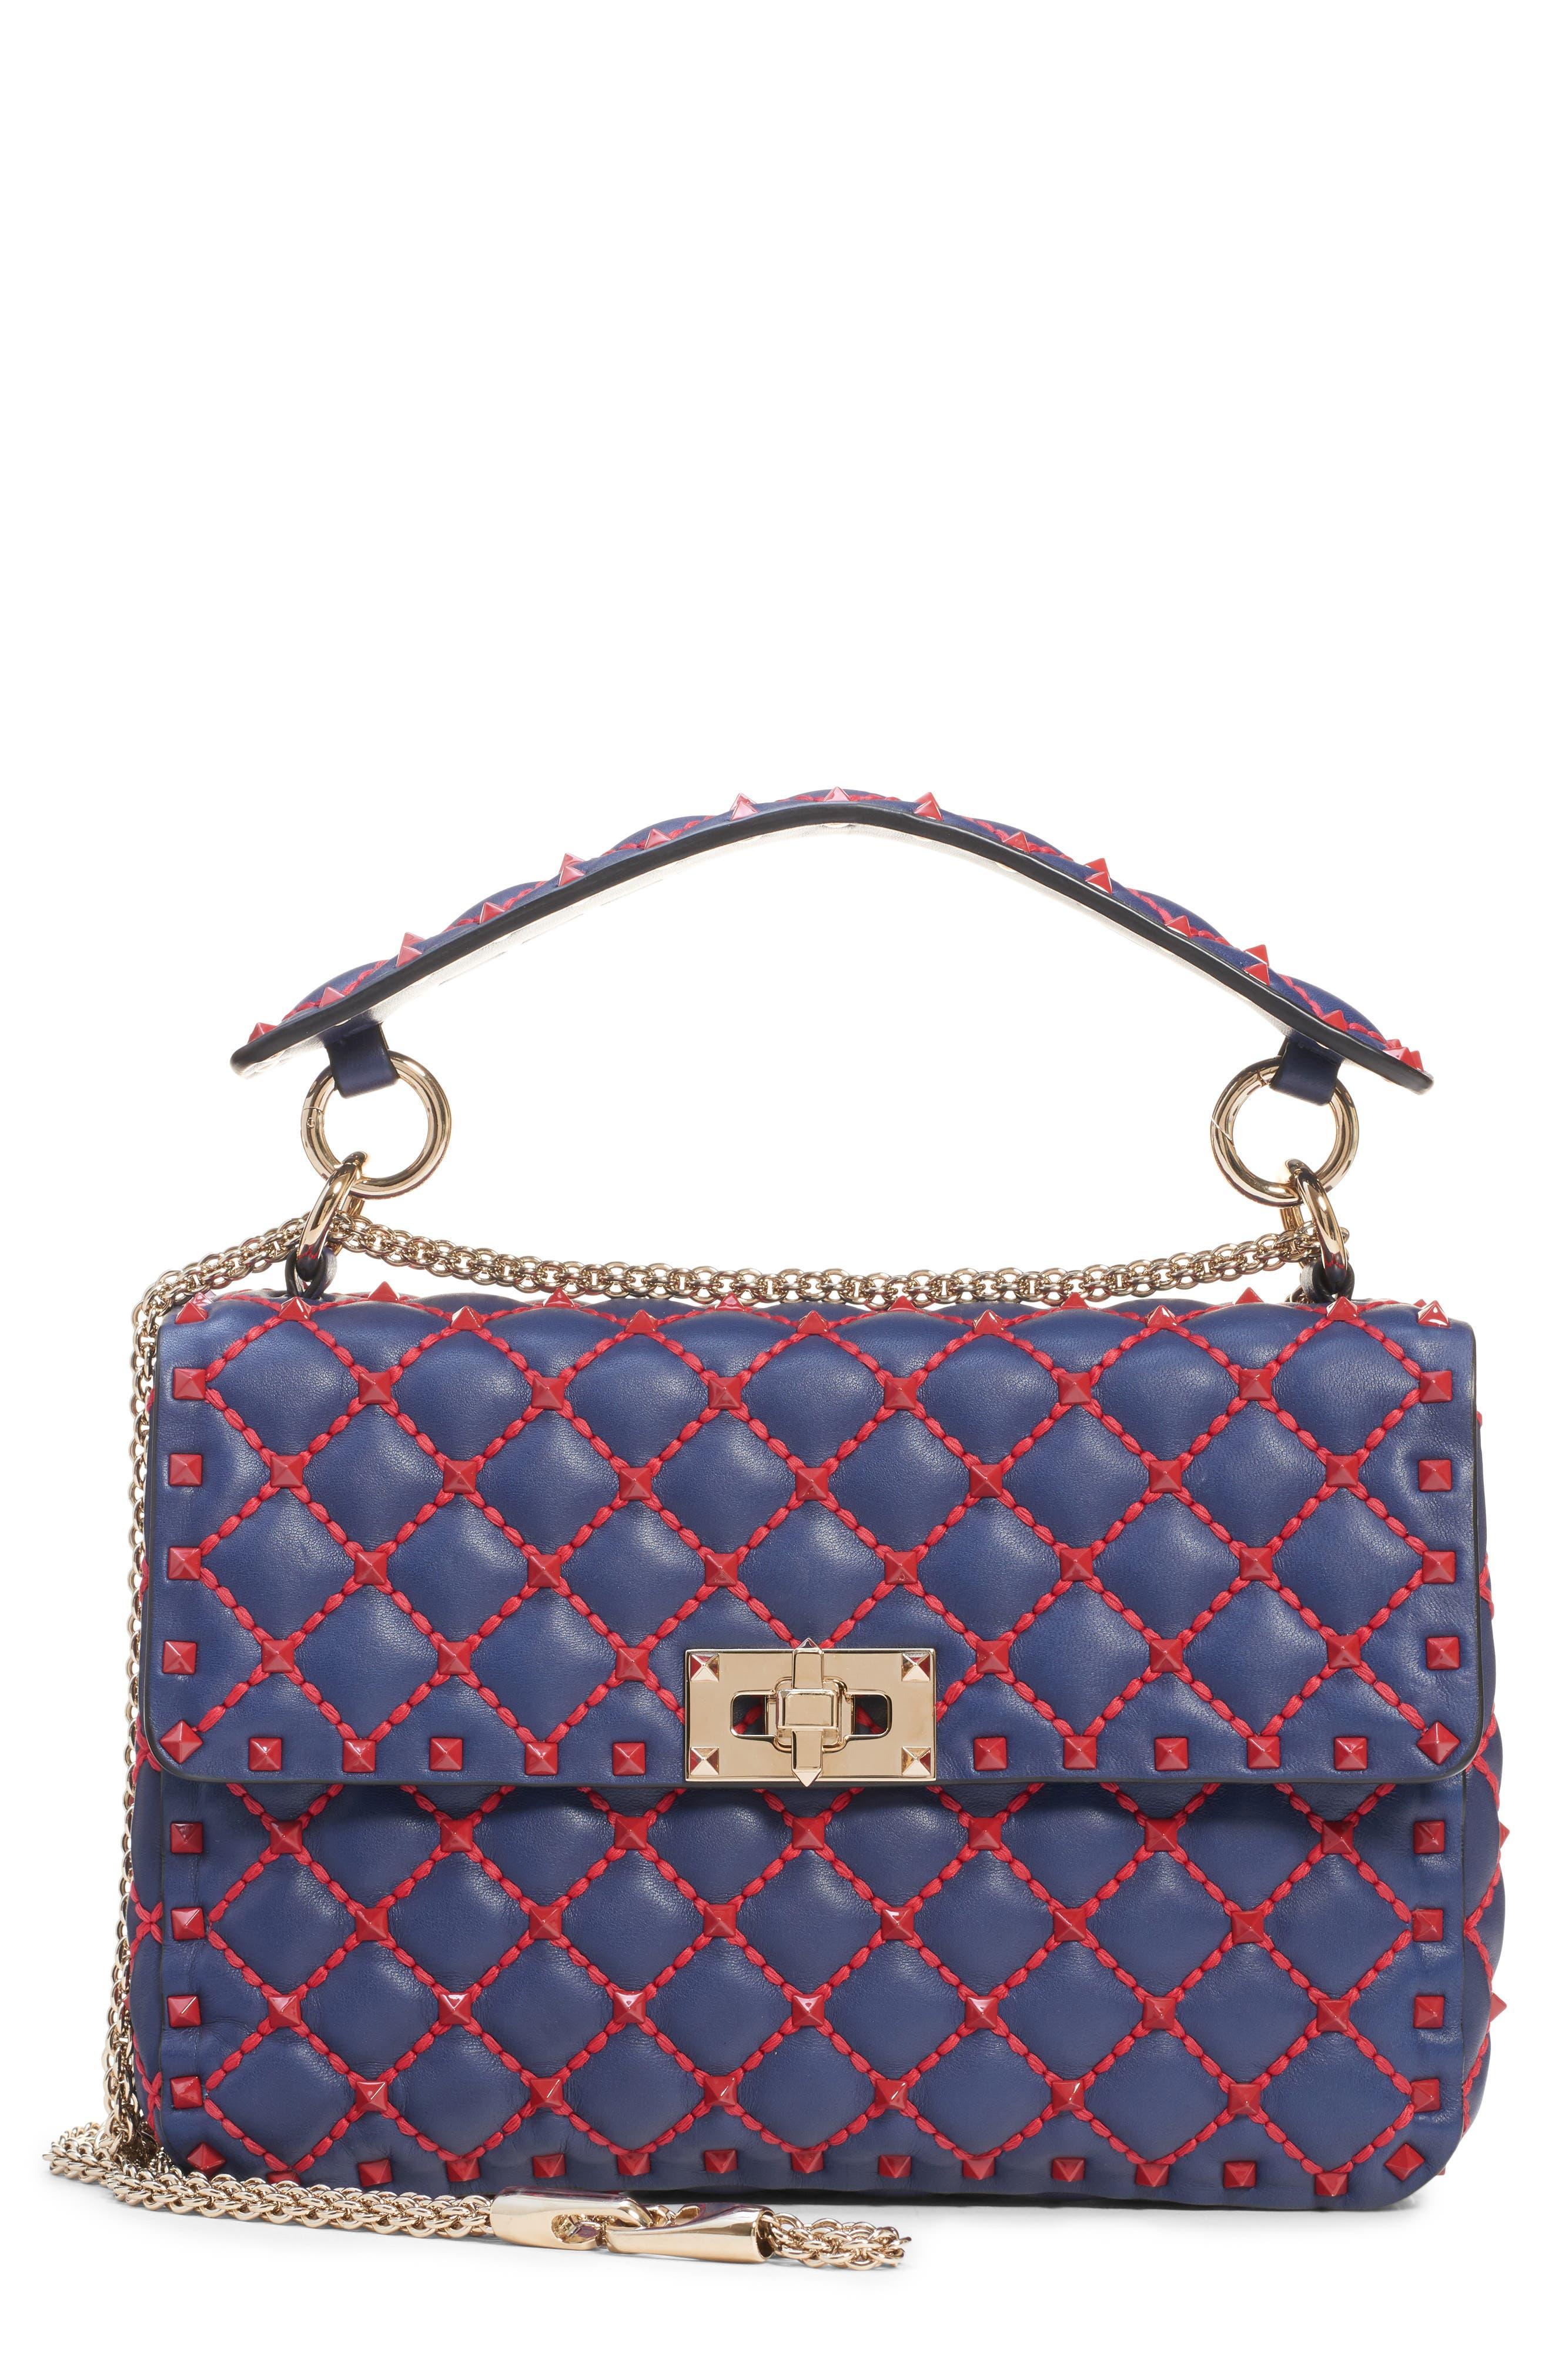 Medium Spike.It Leather Shoulder Bag,                             Main thumbnail 1, color,                             PURE BLUE/ ROSSO